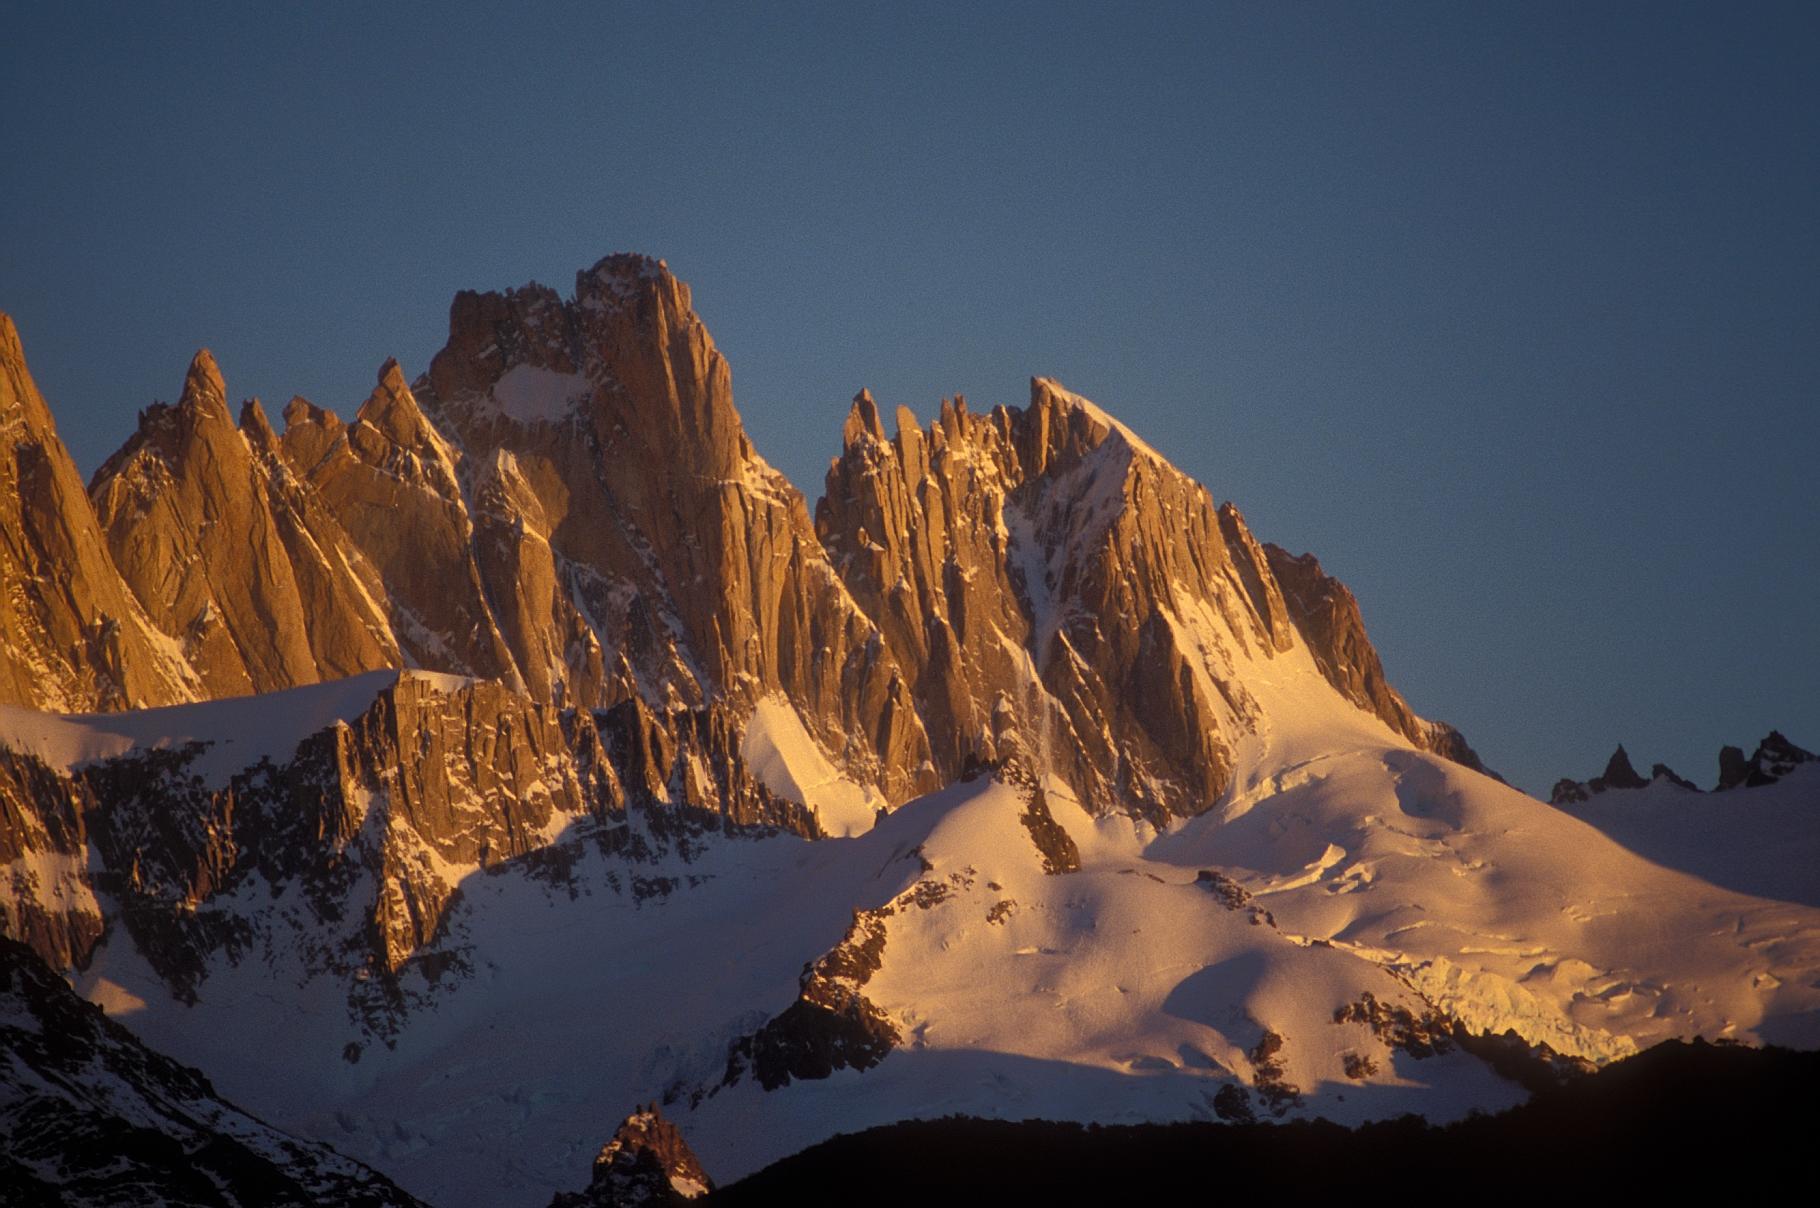 Argentina.Patagonia.Chalten.FitzRoyNeighbors.Sunrise.jpg